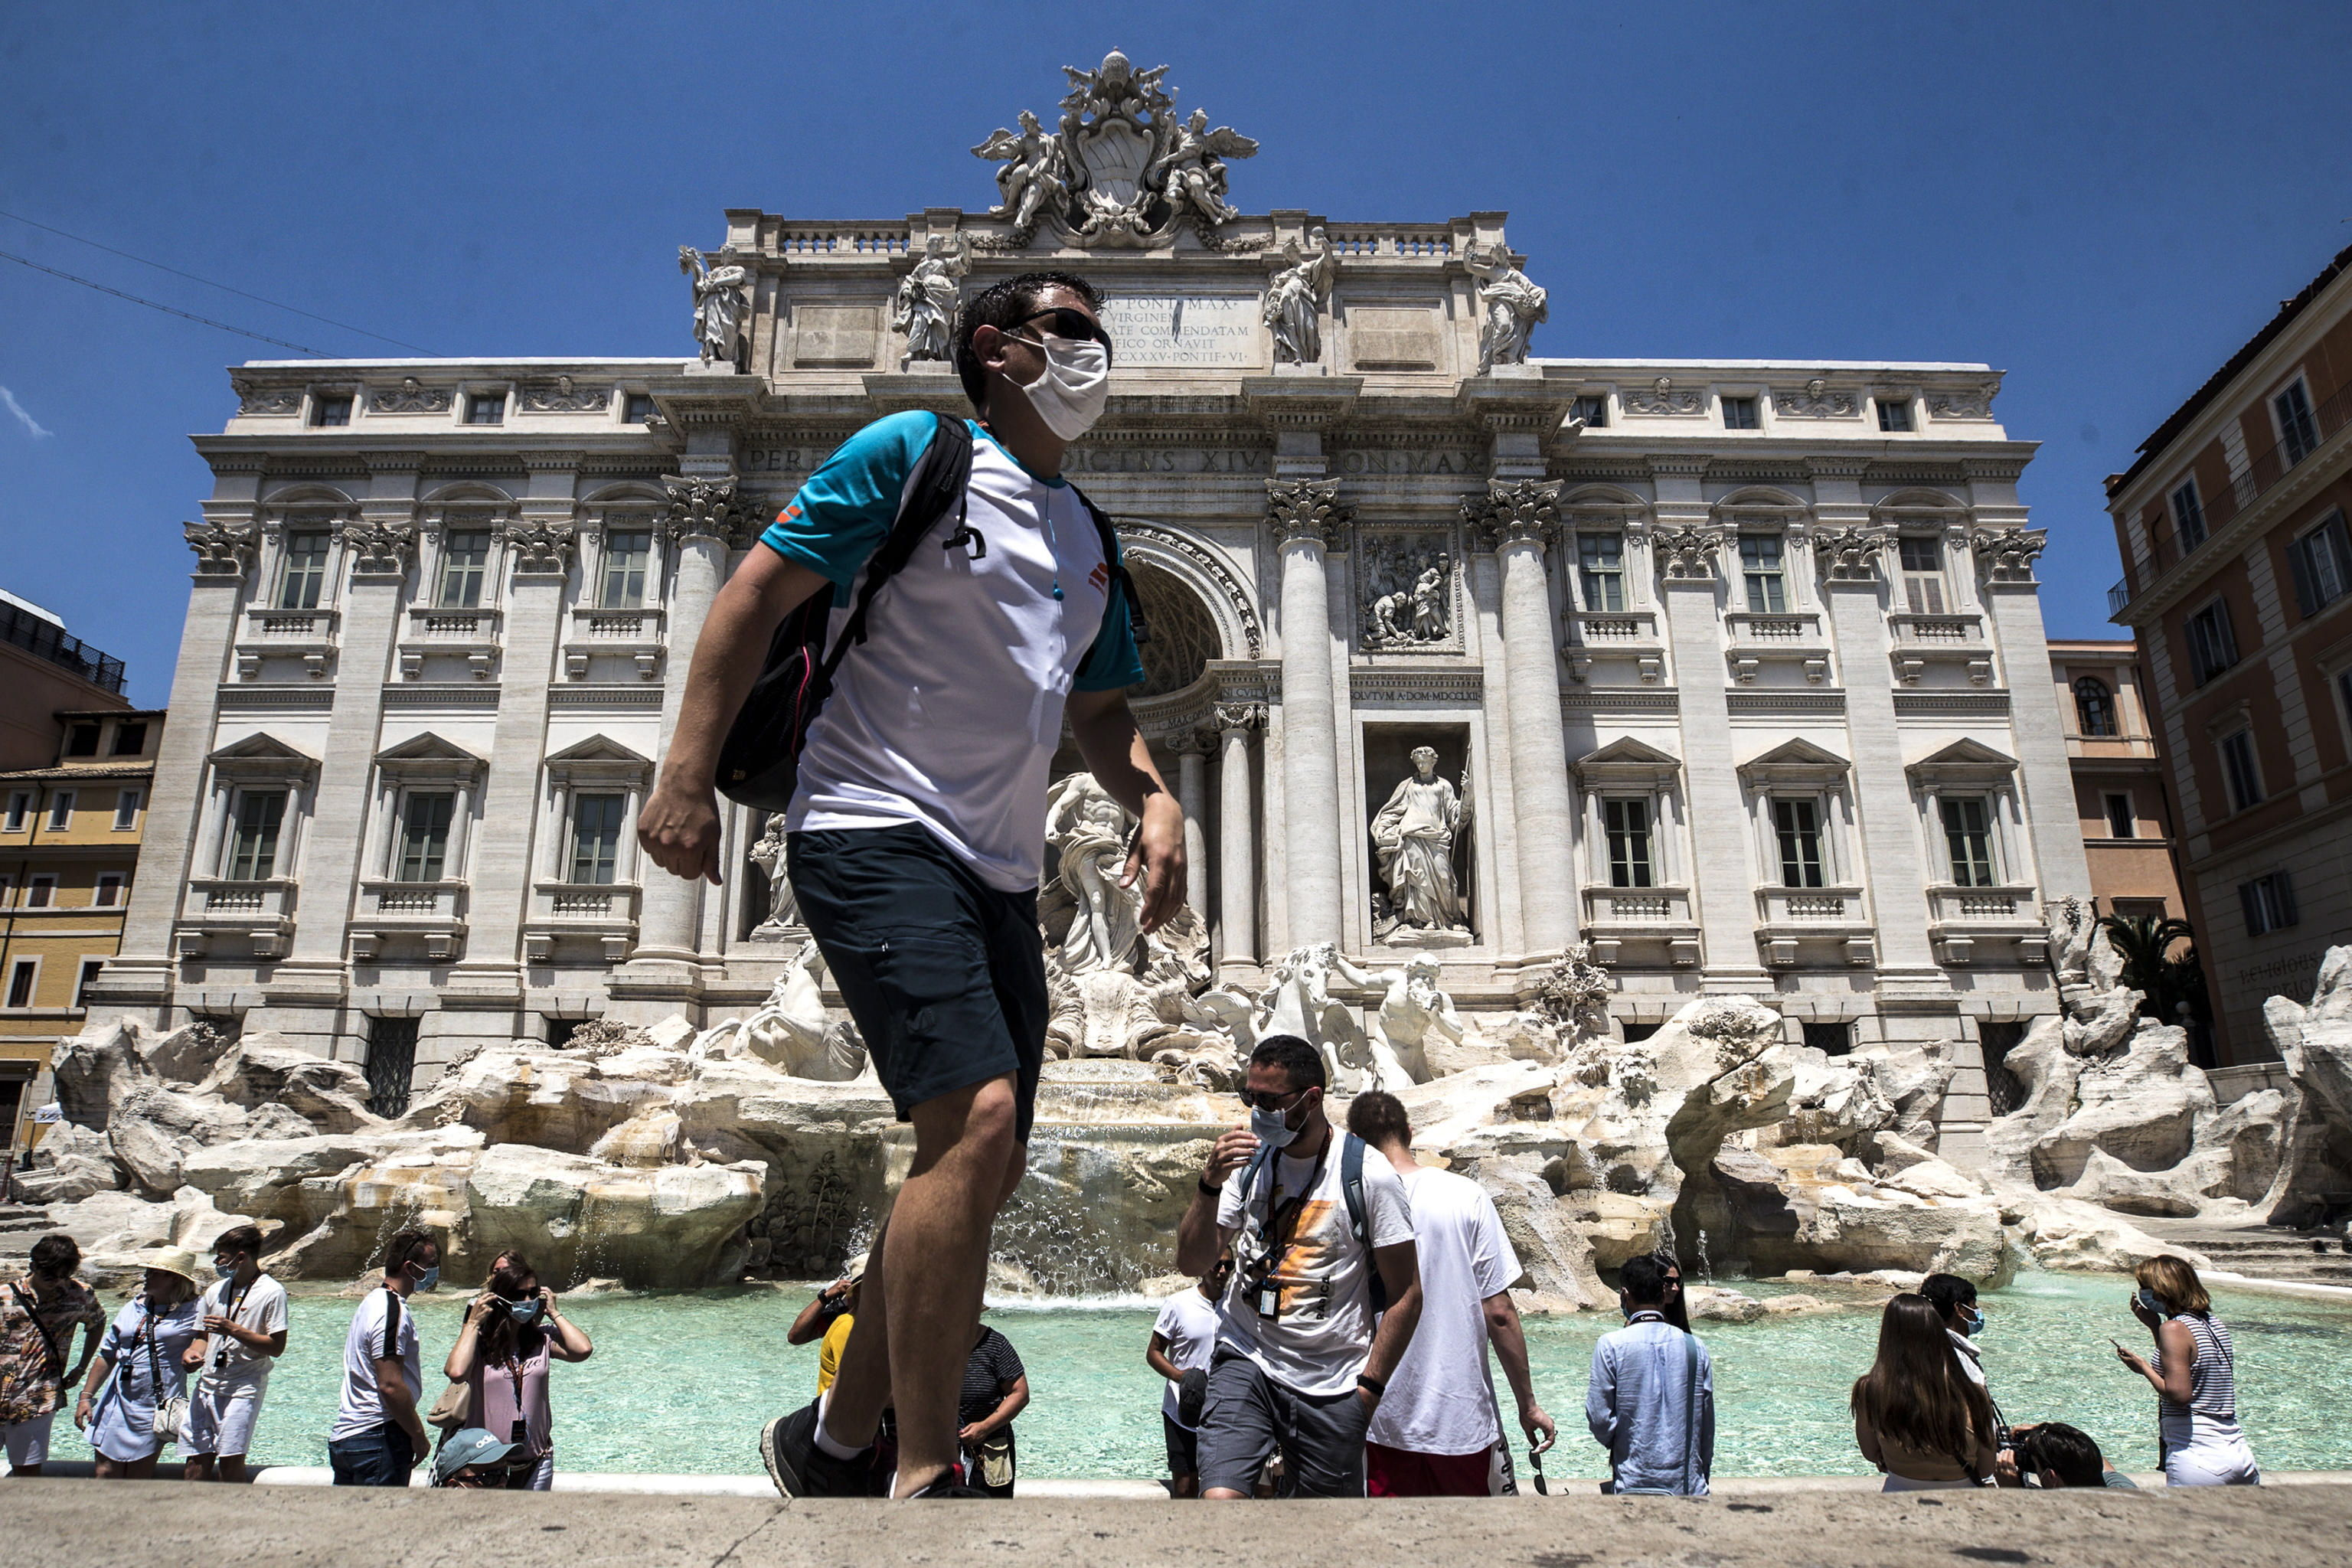 Gente en la Fontana de Trevi en Roma.